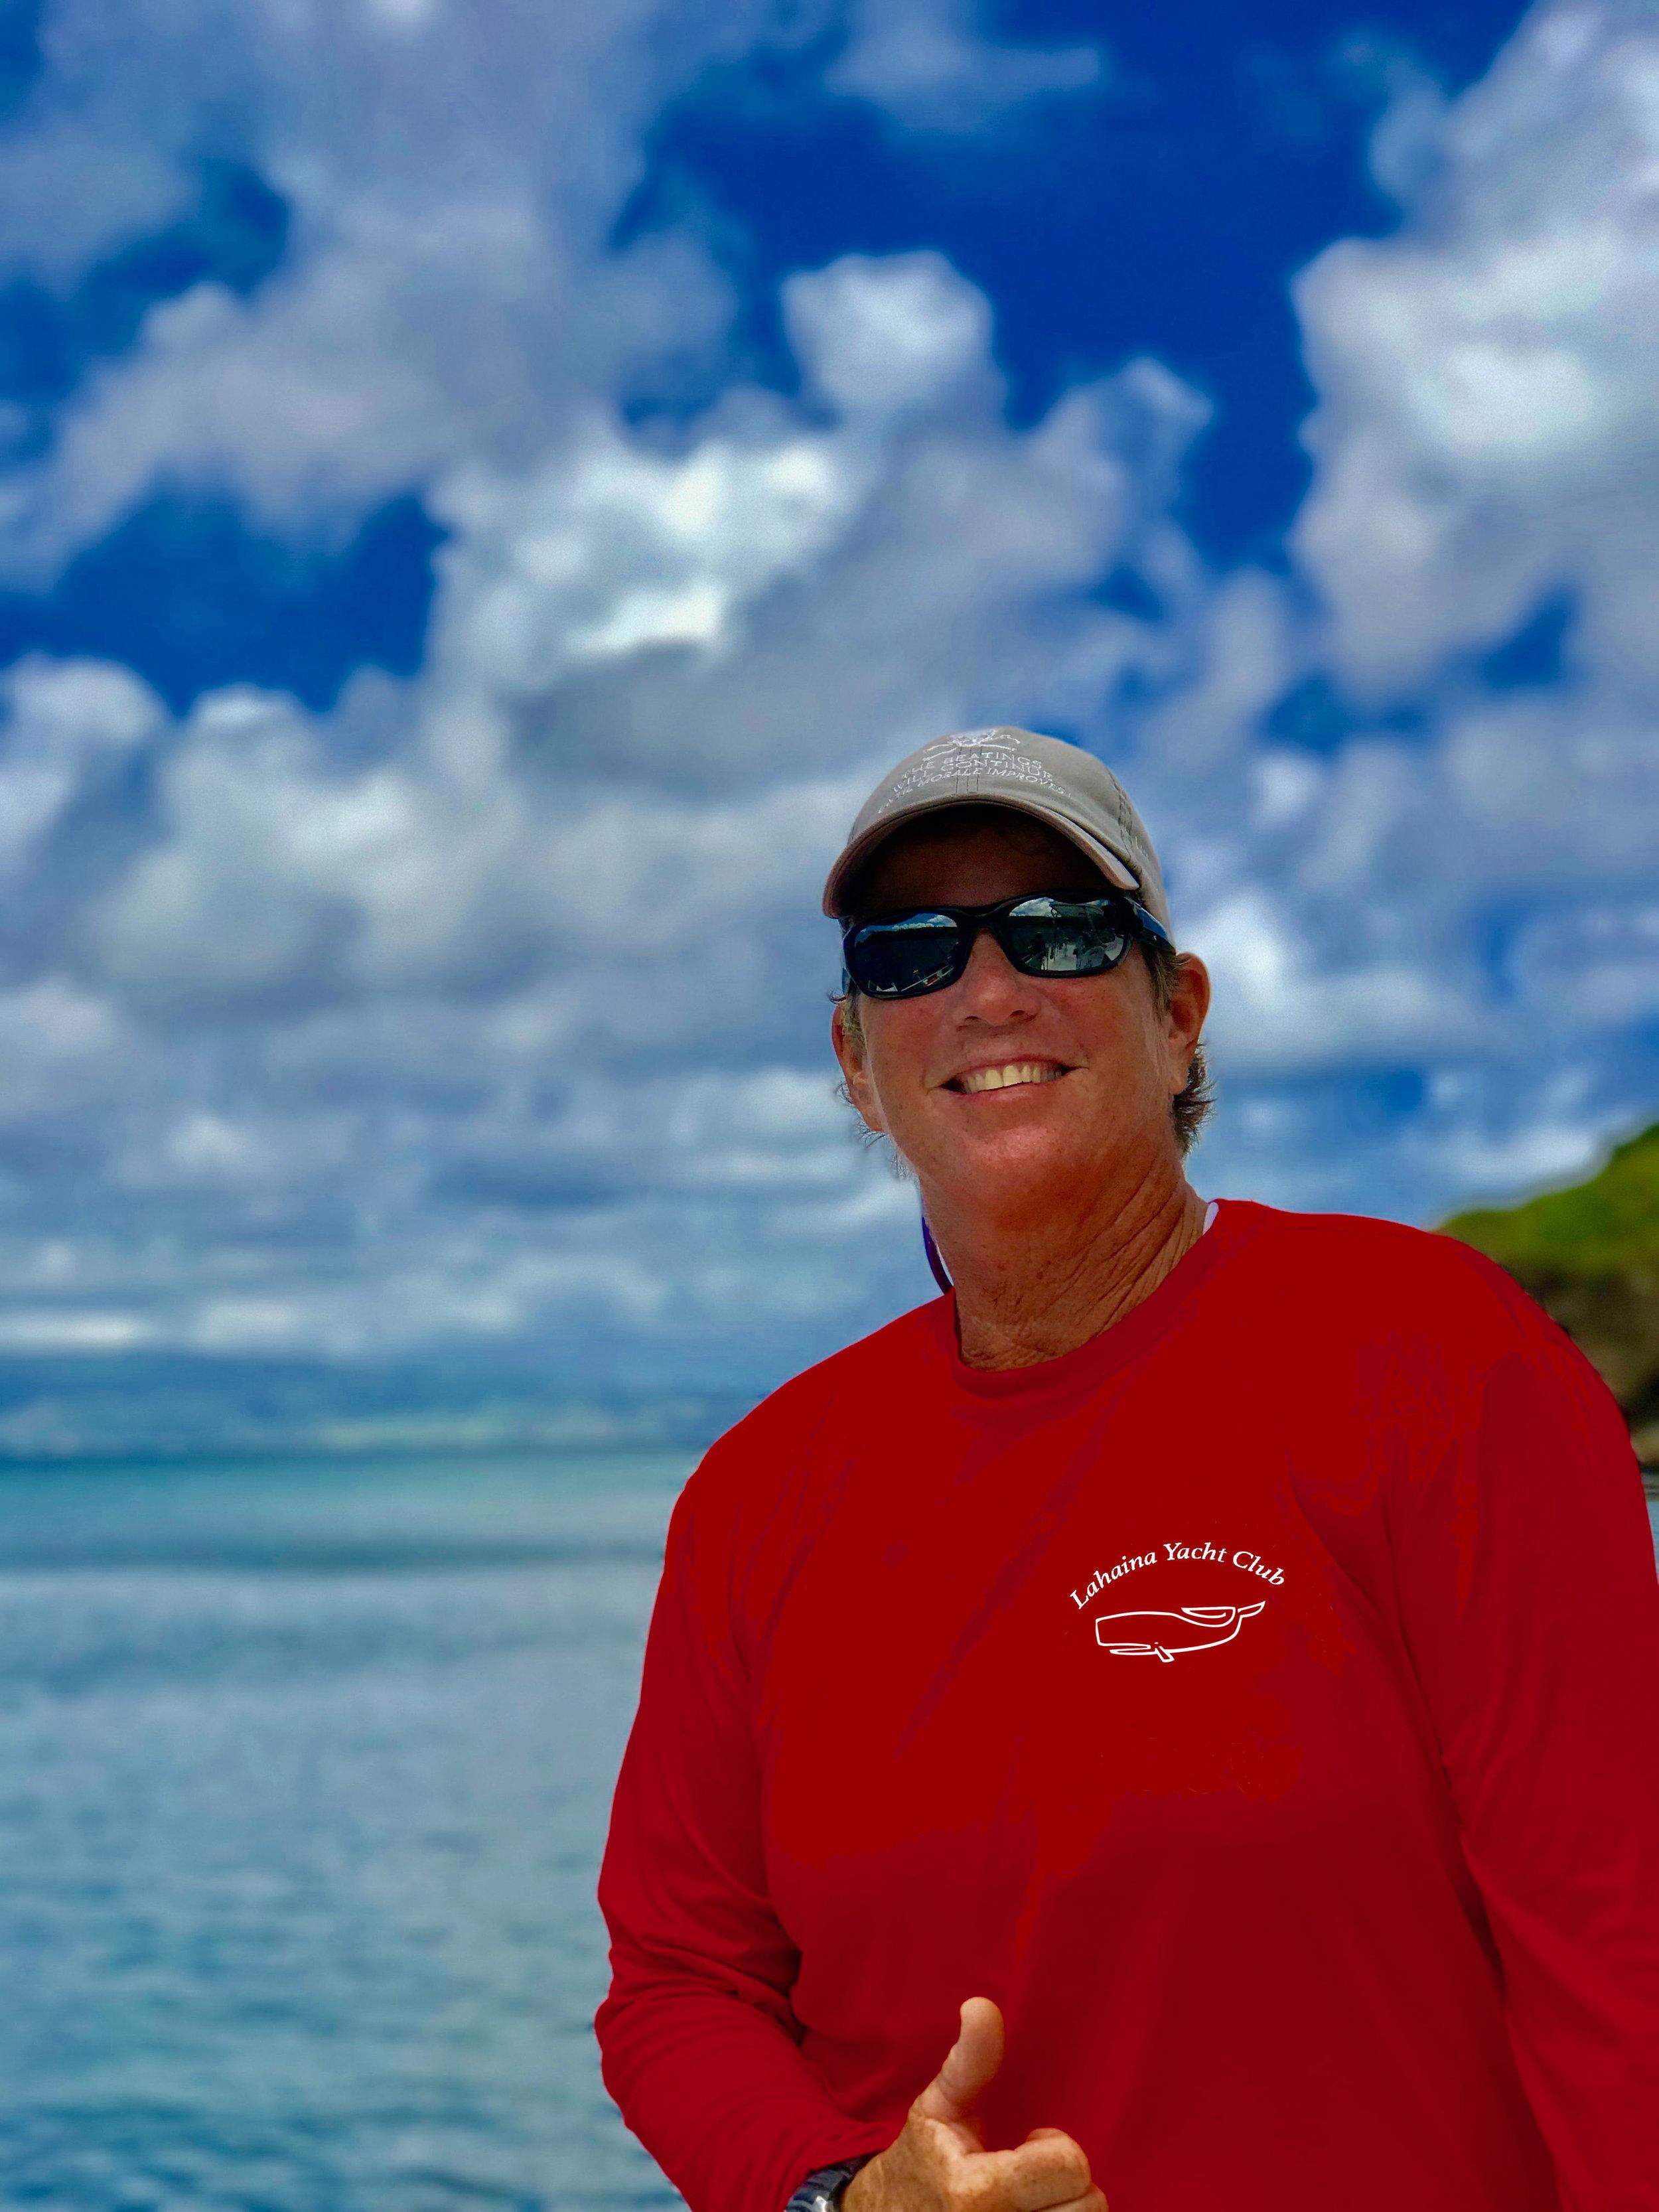 Commodore  - Linda Rickabaugh  commodore@lyc.us